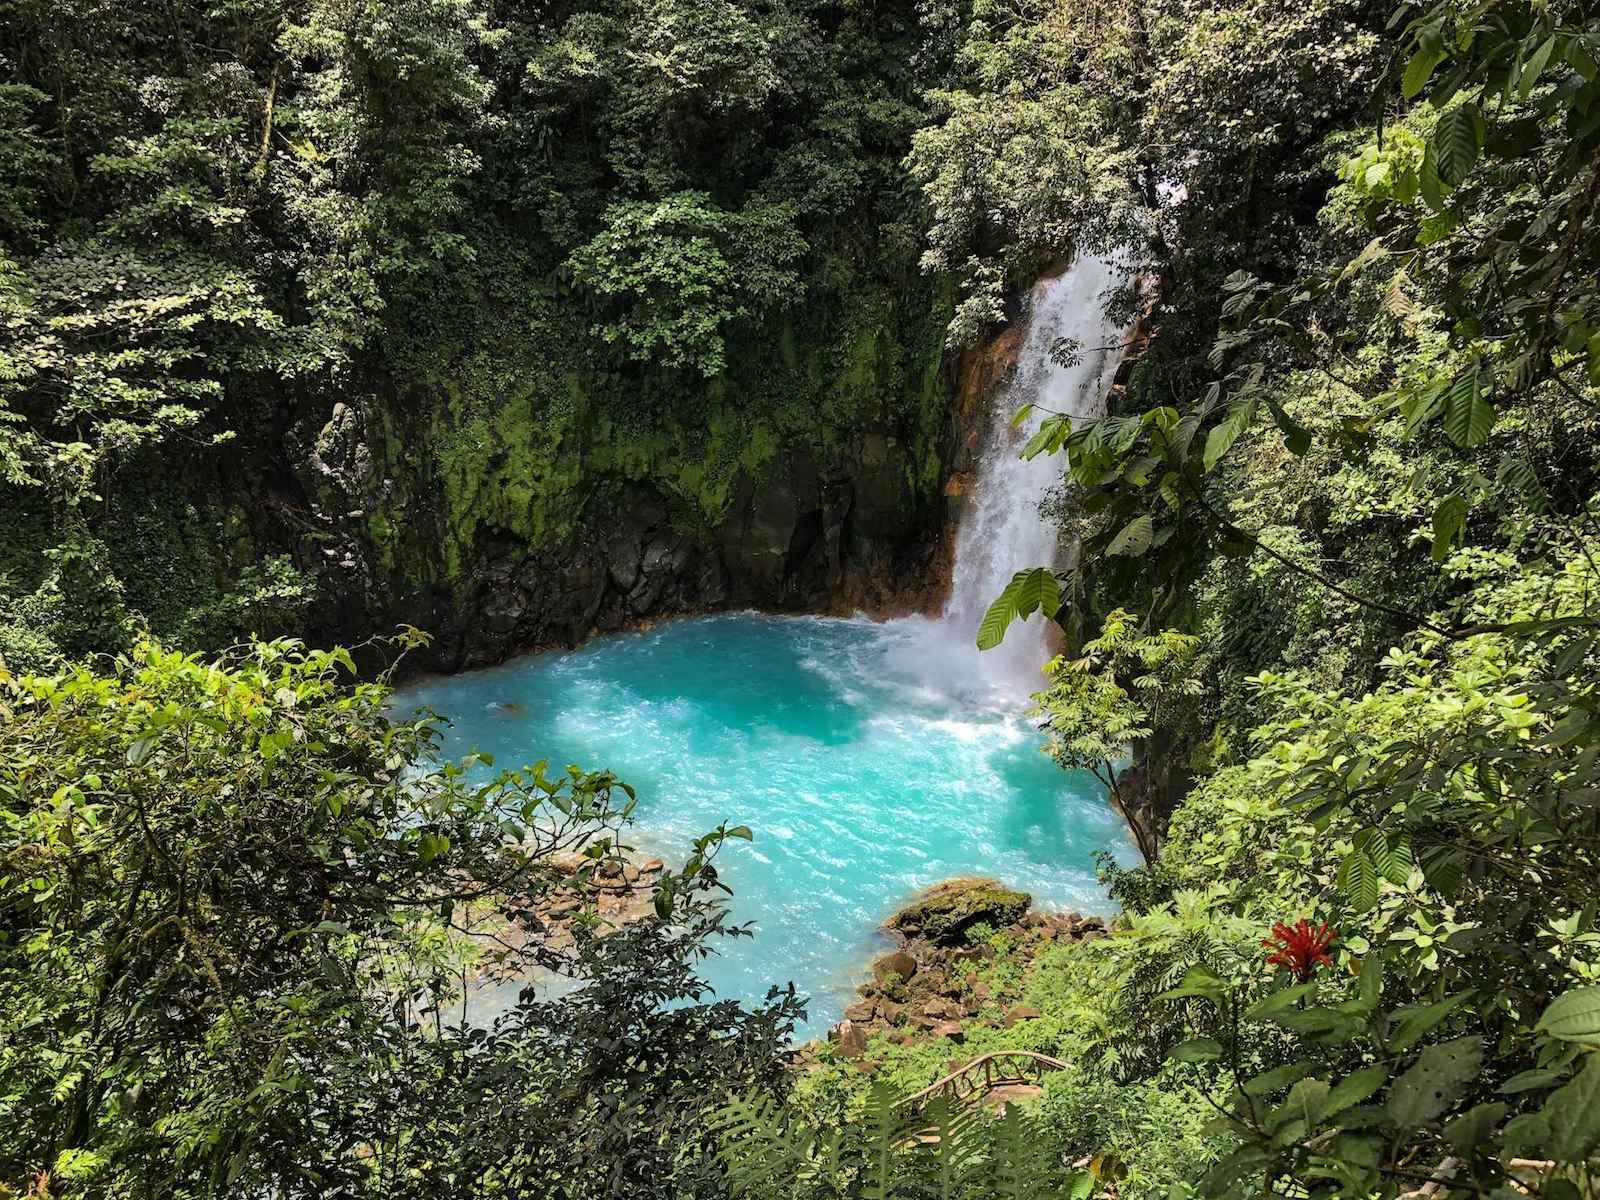 Rio Celeste - Turquoise waterval